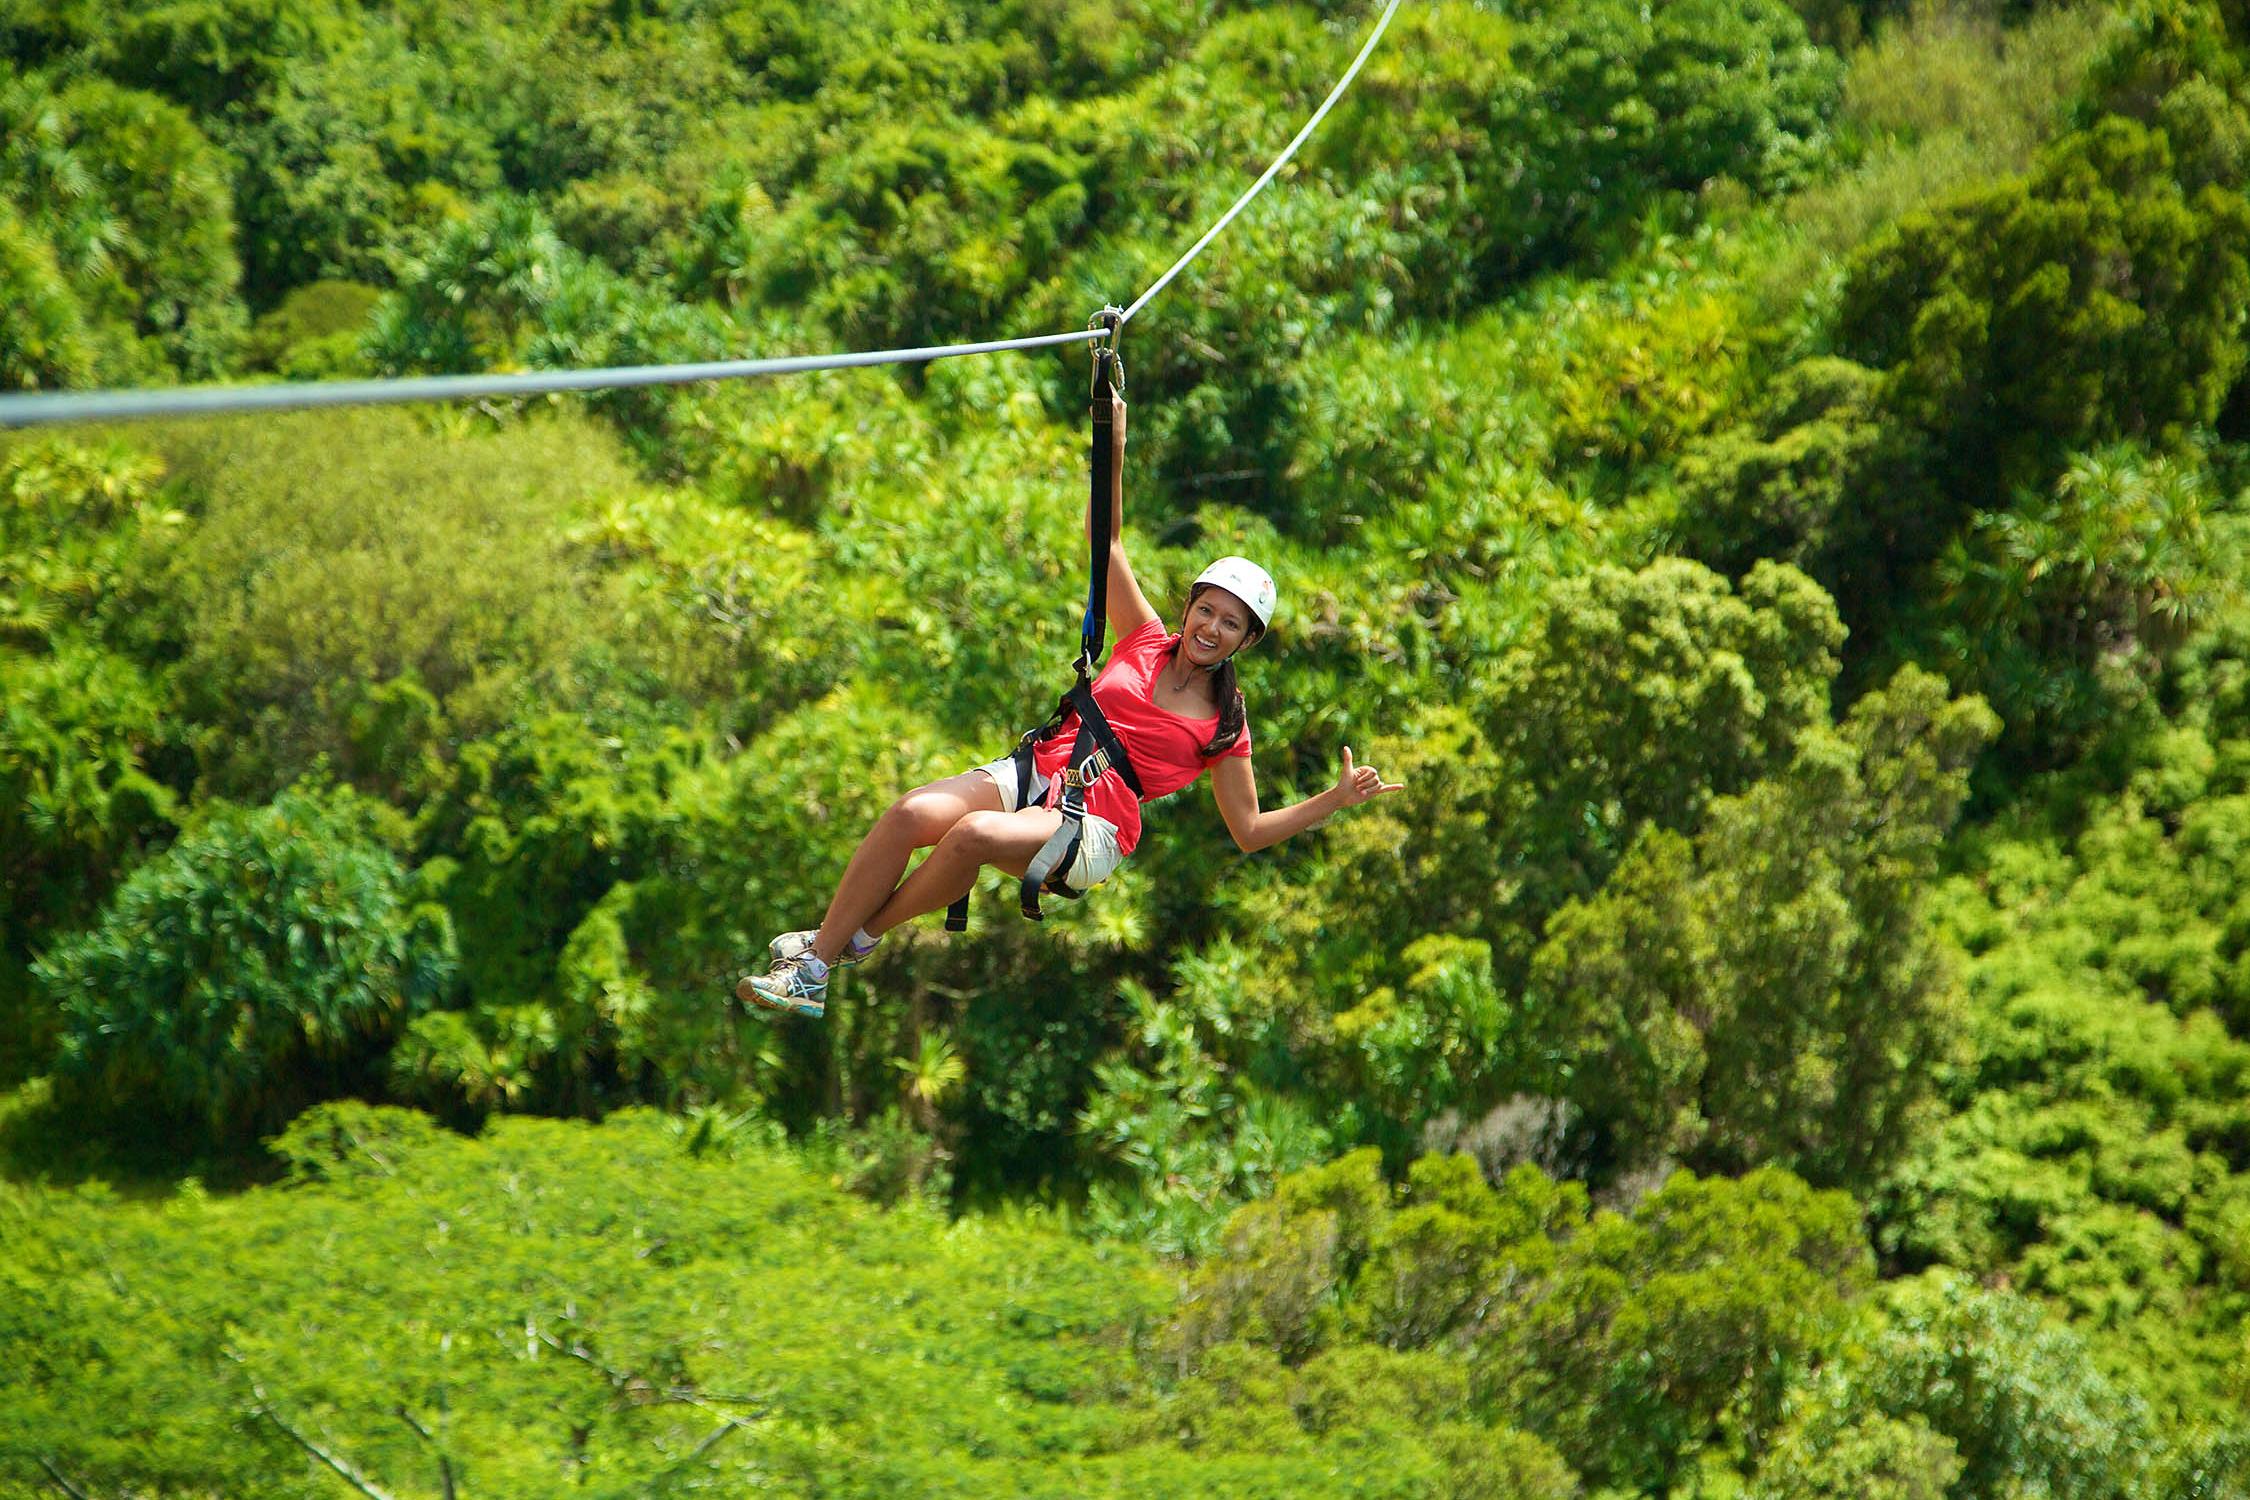 ZIPLINING - Ziplining is fun for those looking to combine island sightseeing with thrills and adventure. Kauai is the Hawaiian island with the most ziplines.Outfitters KauaiKoloa ZiplineKauai Backcountry AdventuresJust Live